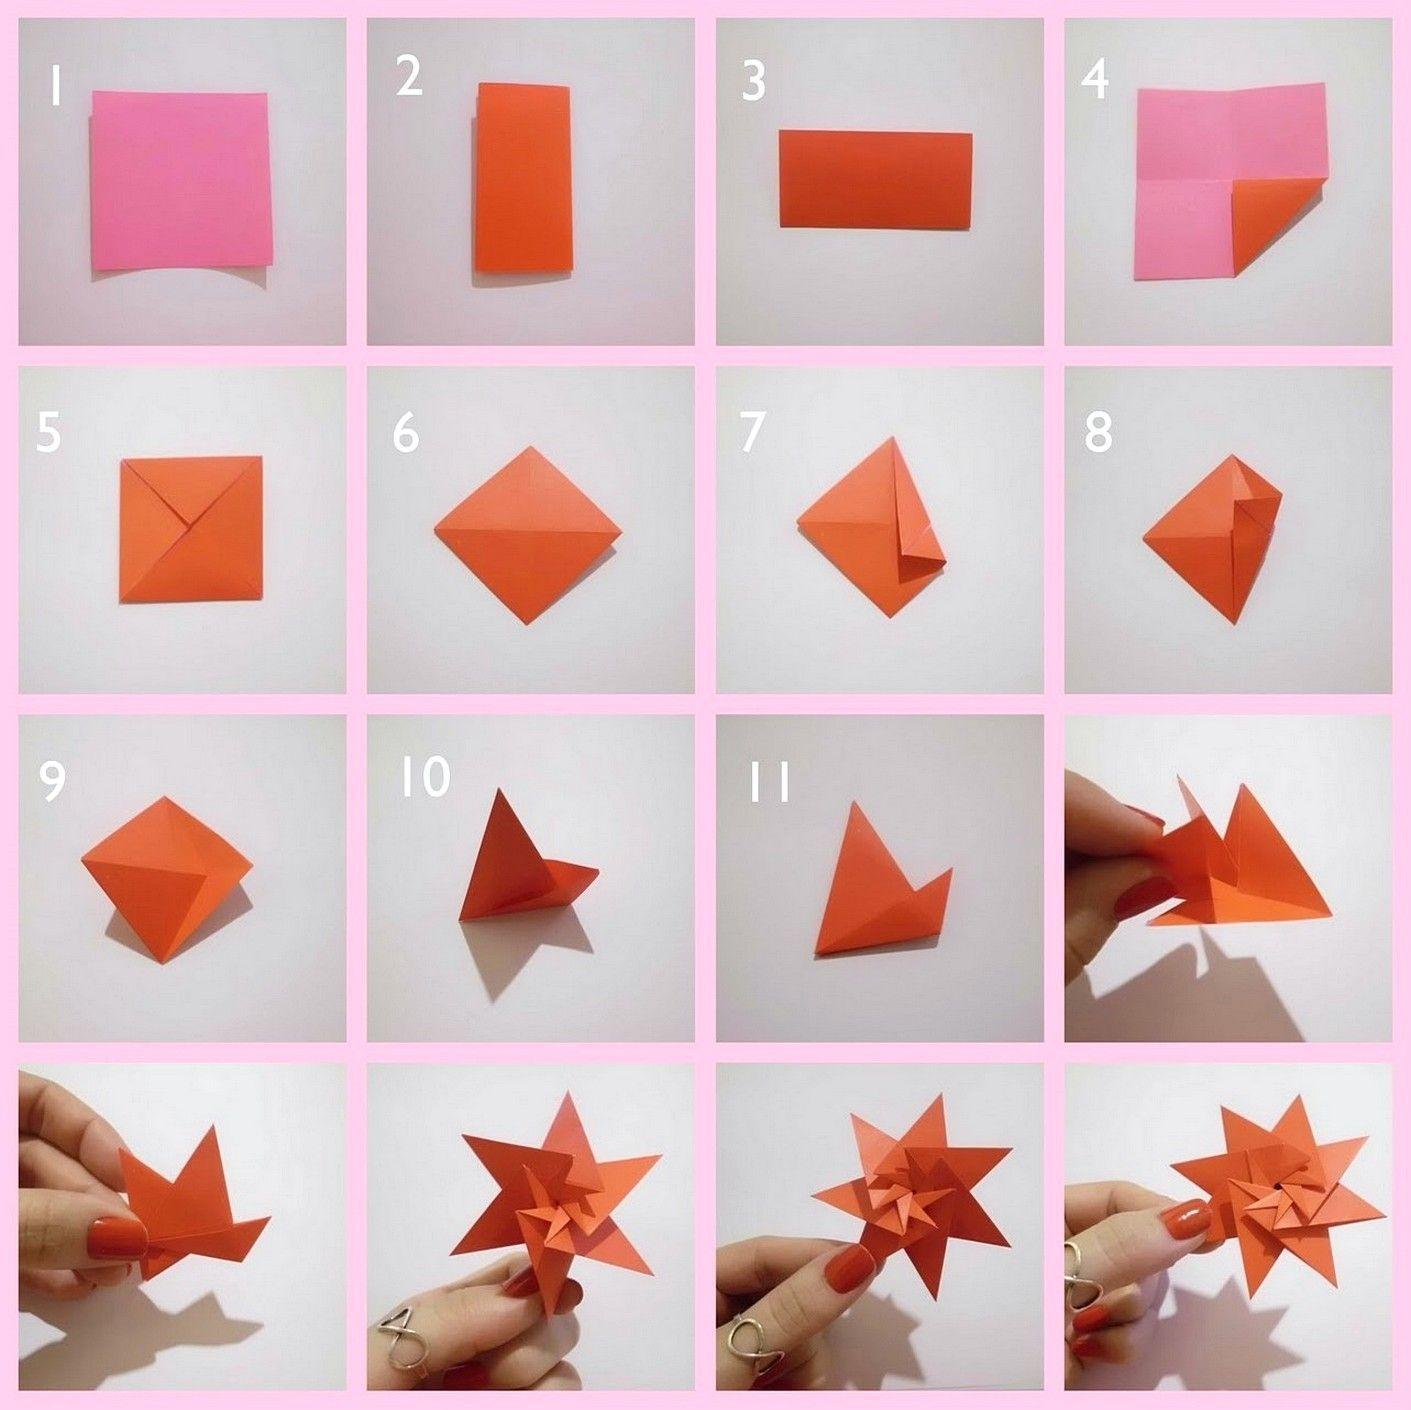 Cara Membuat Hiasan Dinding Kamar Sendiri Dari Kertas Origami Motif Bunga Https Www Tokopedia Com Livon Etalase Key Origami Mudah Origami Tutorial Origami